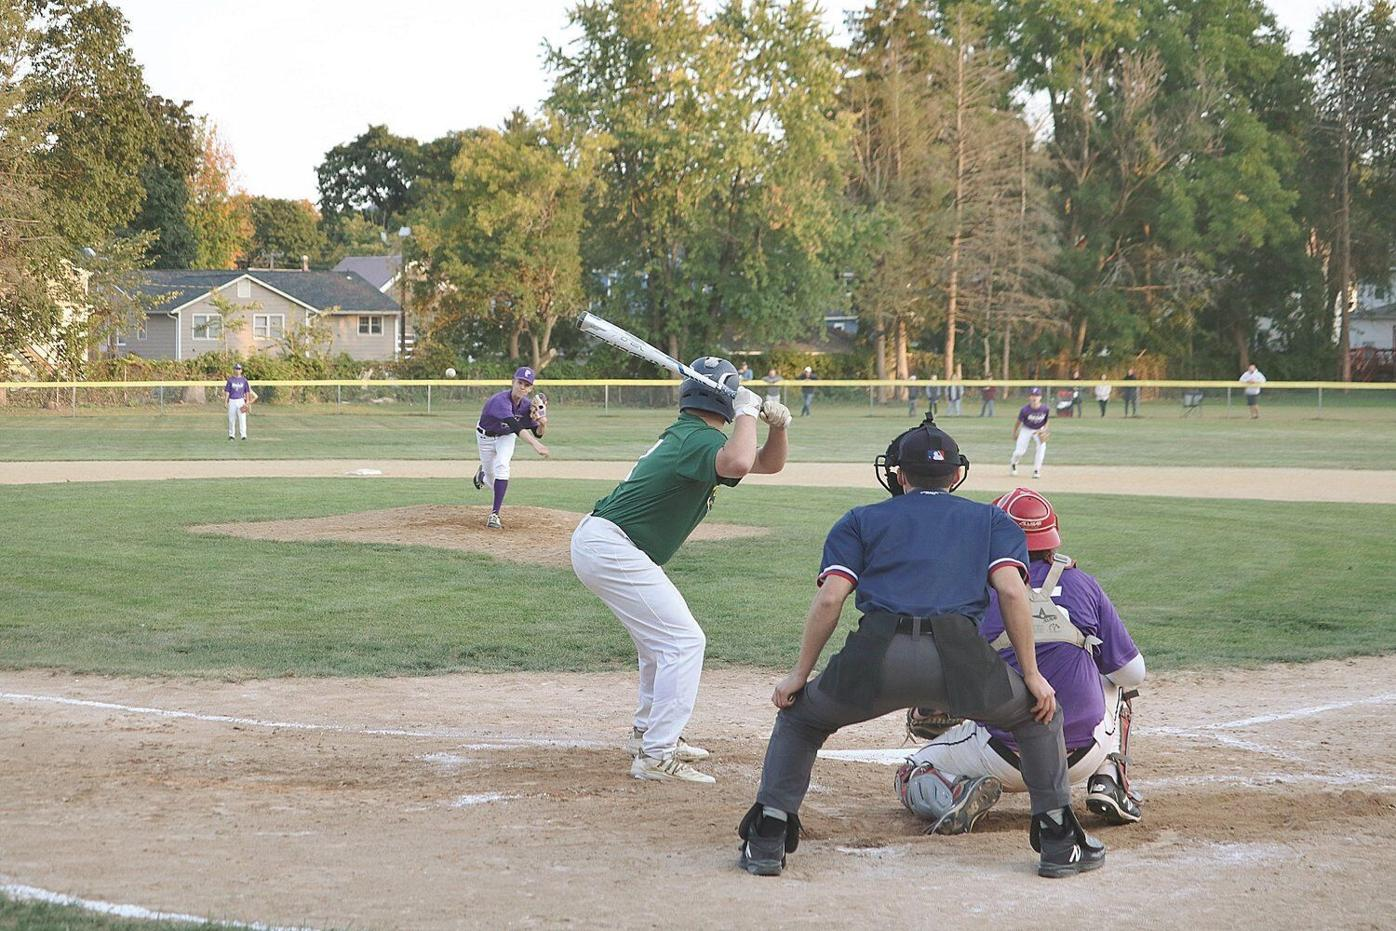 Pittsfield downs rival Taconic in Senior Babe Ruth fall baseball showdown